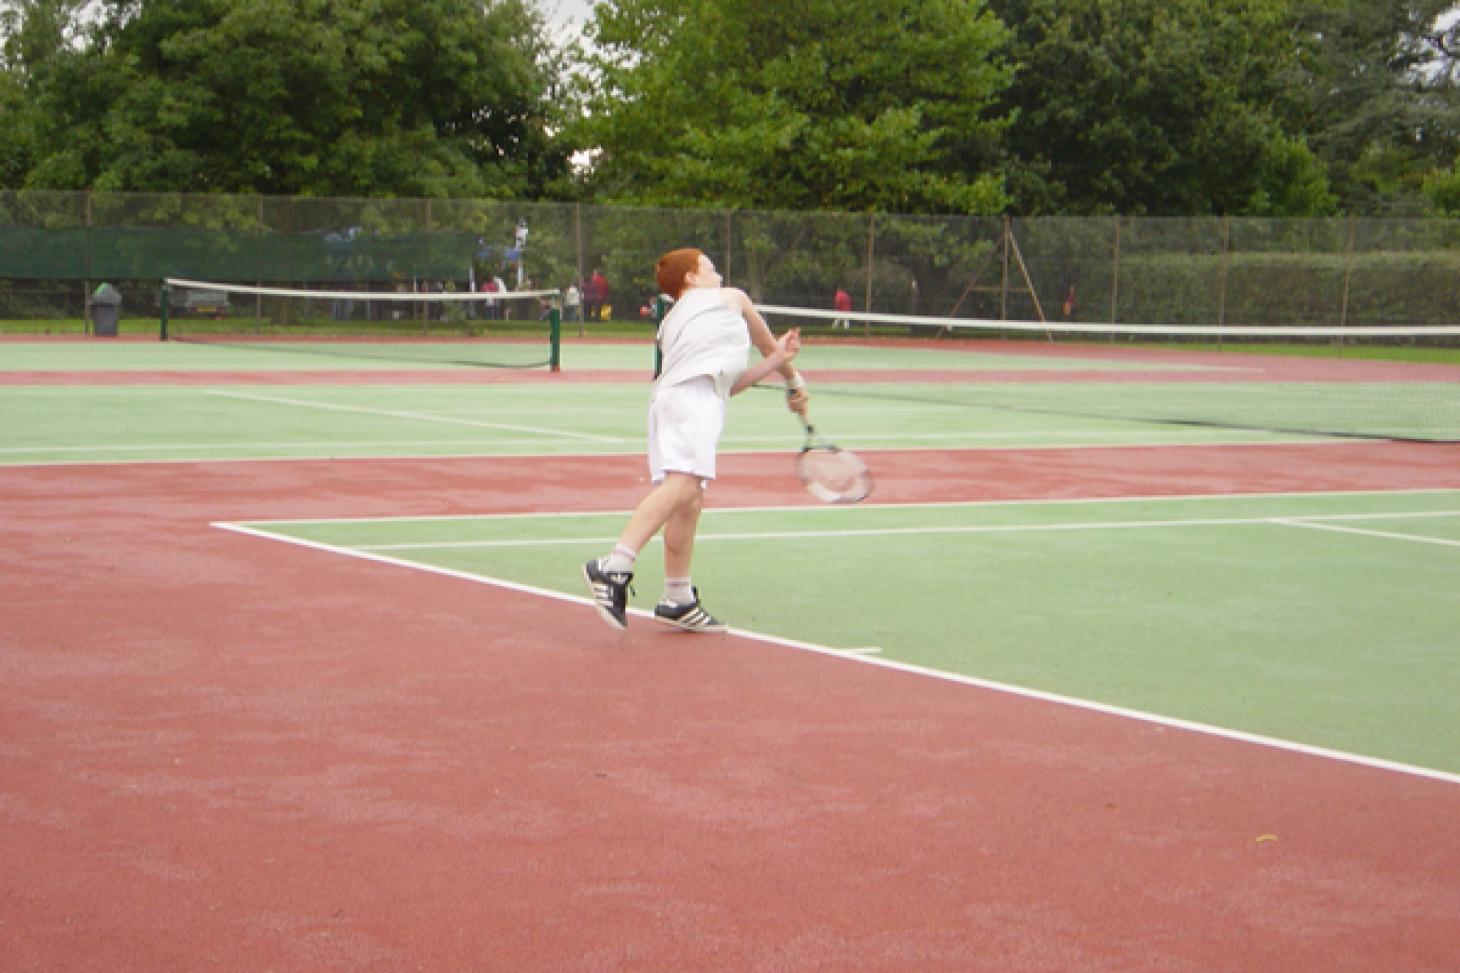 Boston Manor Park Outdoor | Hard (macadam) tennis court